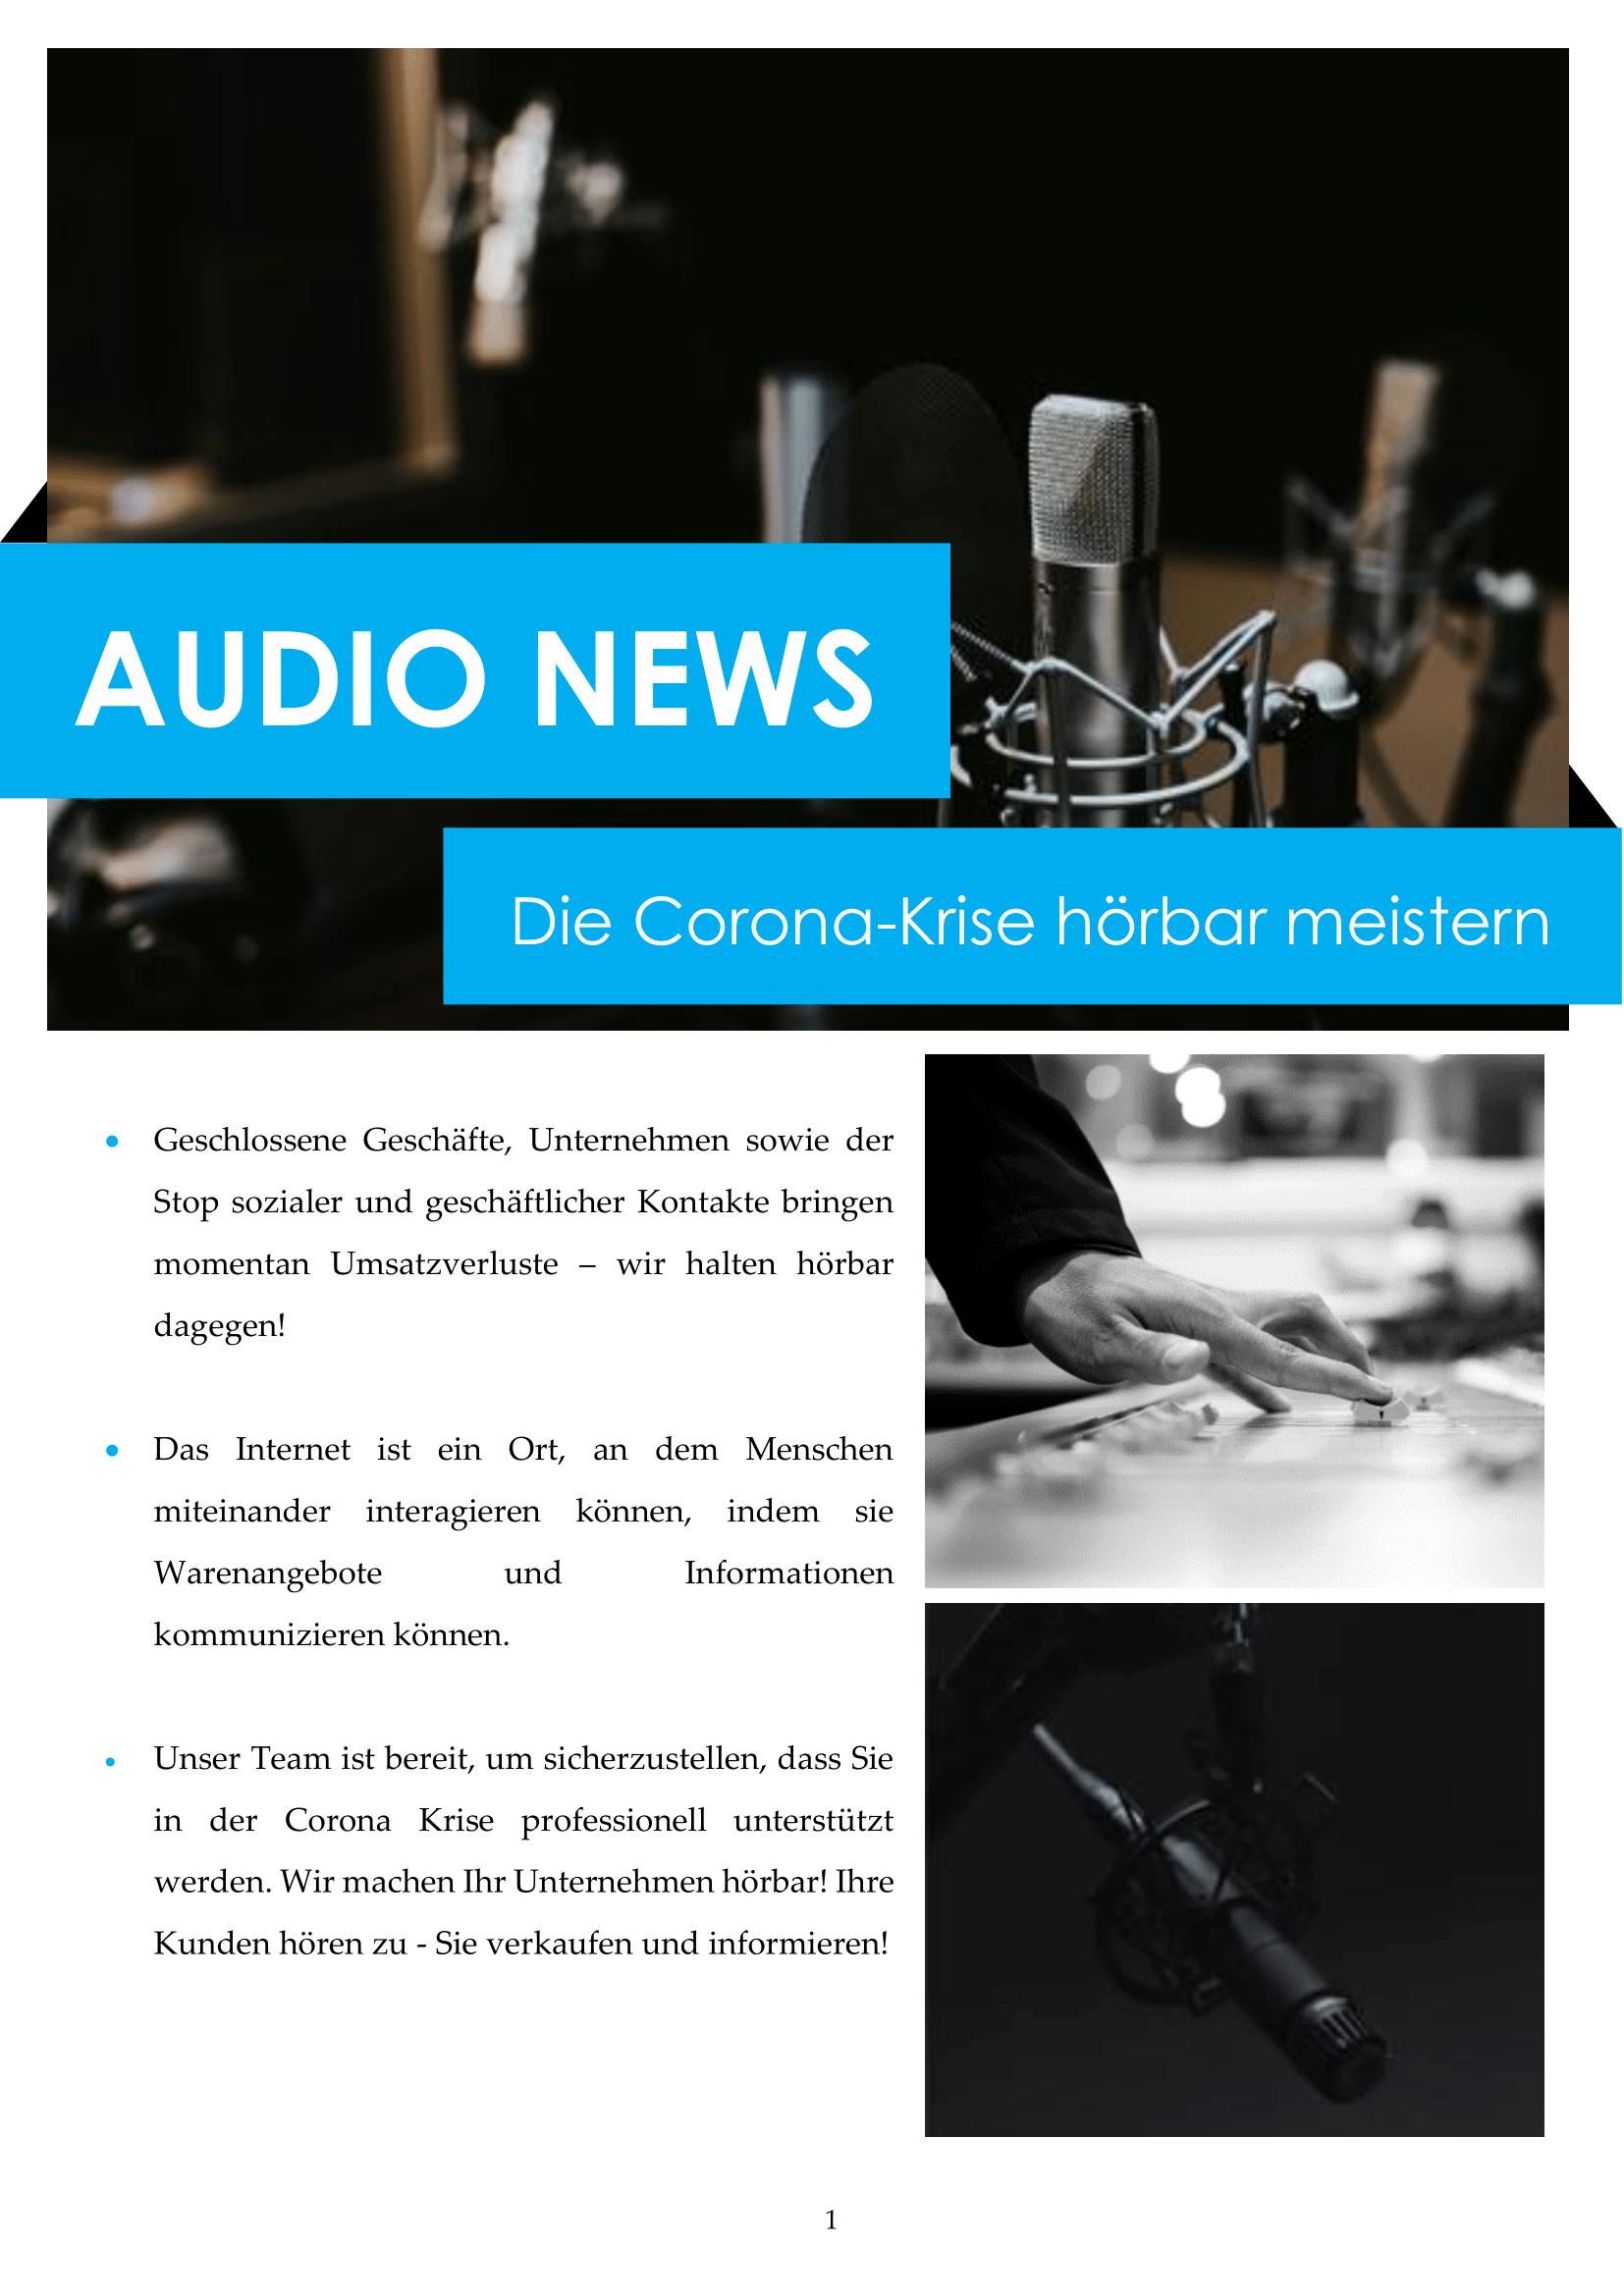 Audio News Service